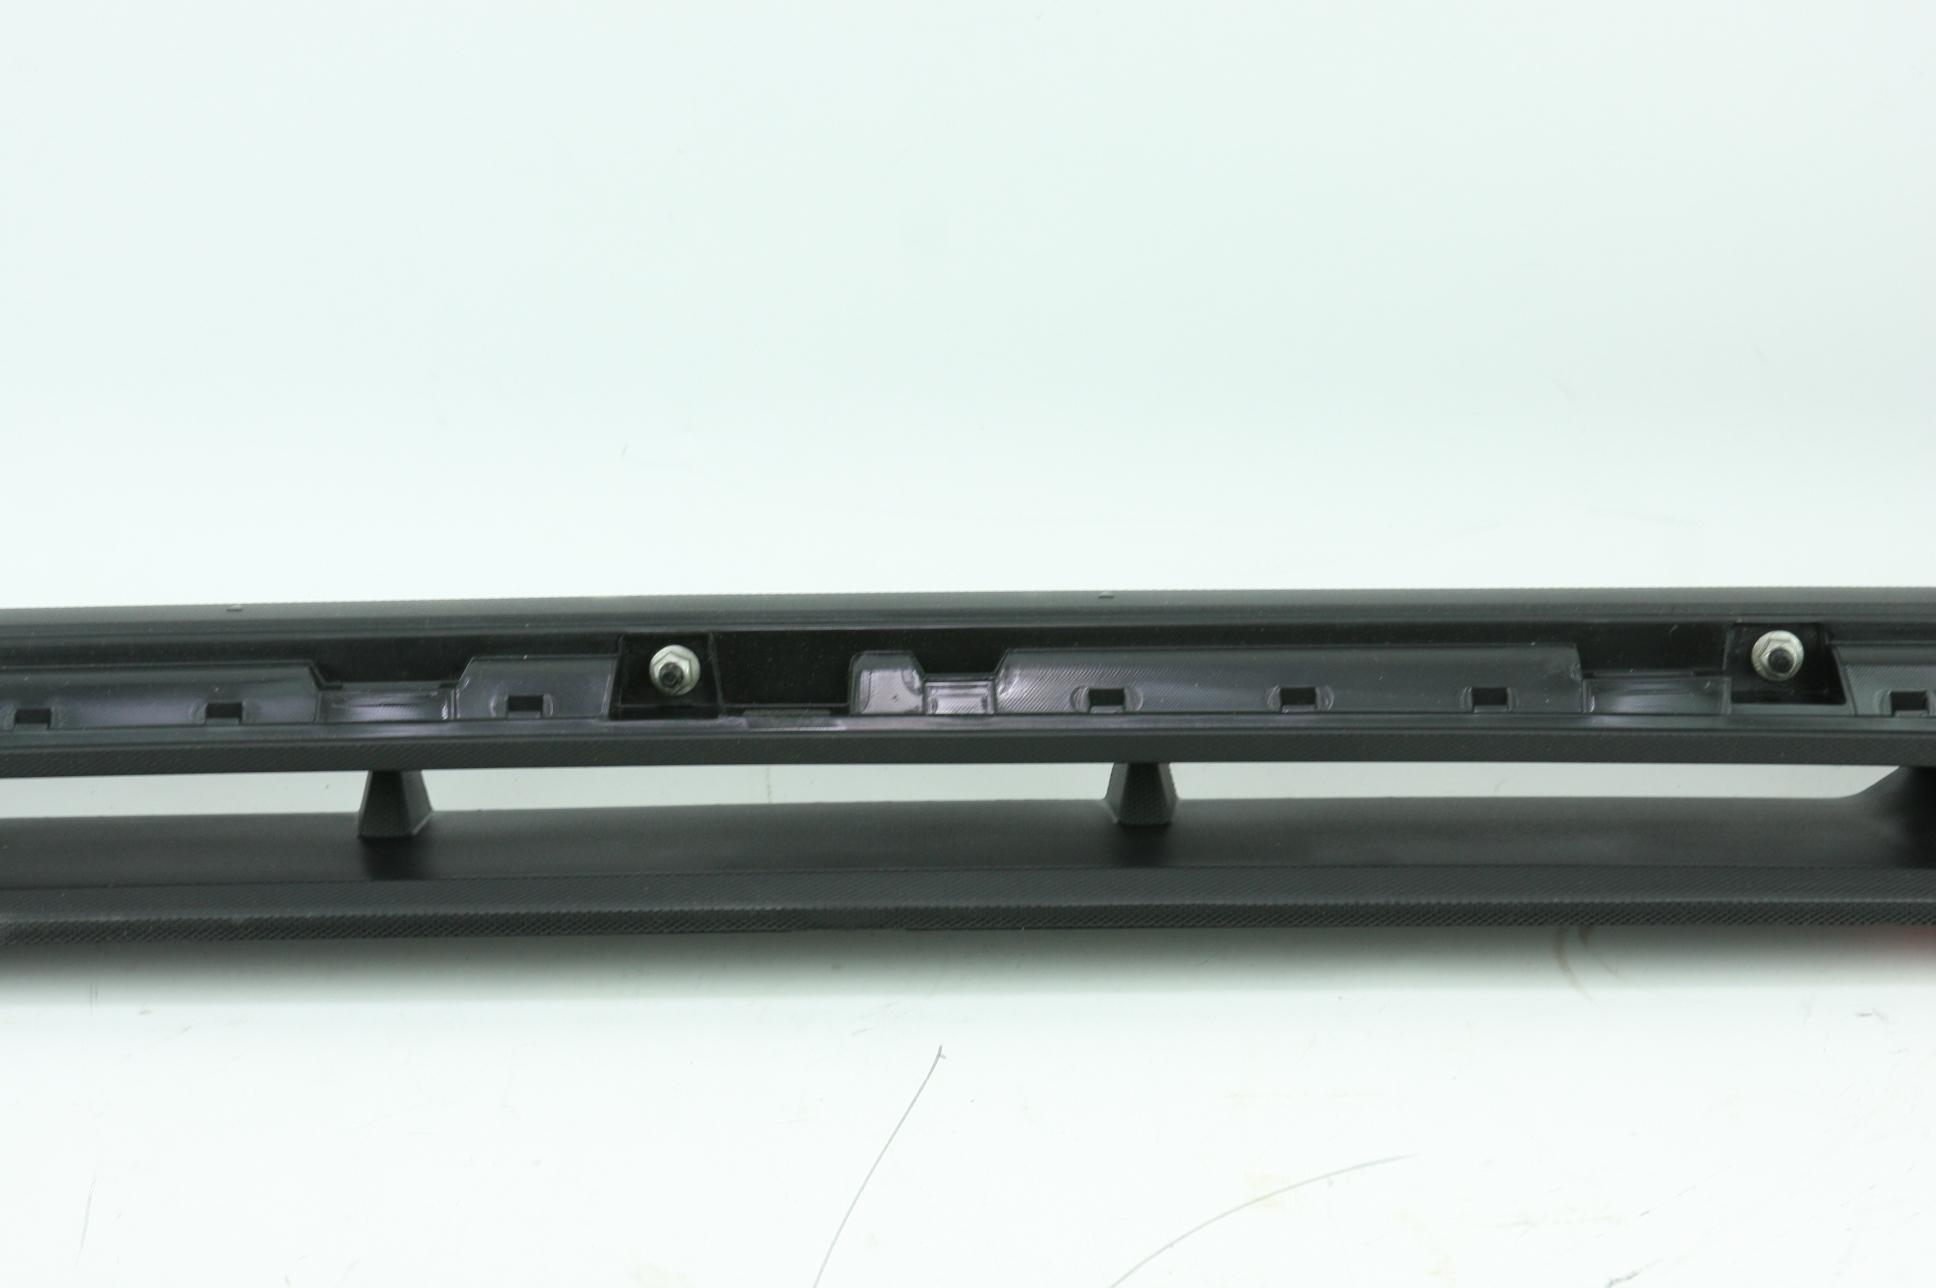 *** New Genuine OEM 23324213 GM Roof Rack Luggage Carrier Side Rail LH 84016250 - image 5